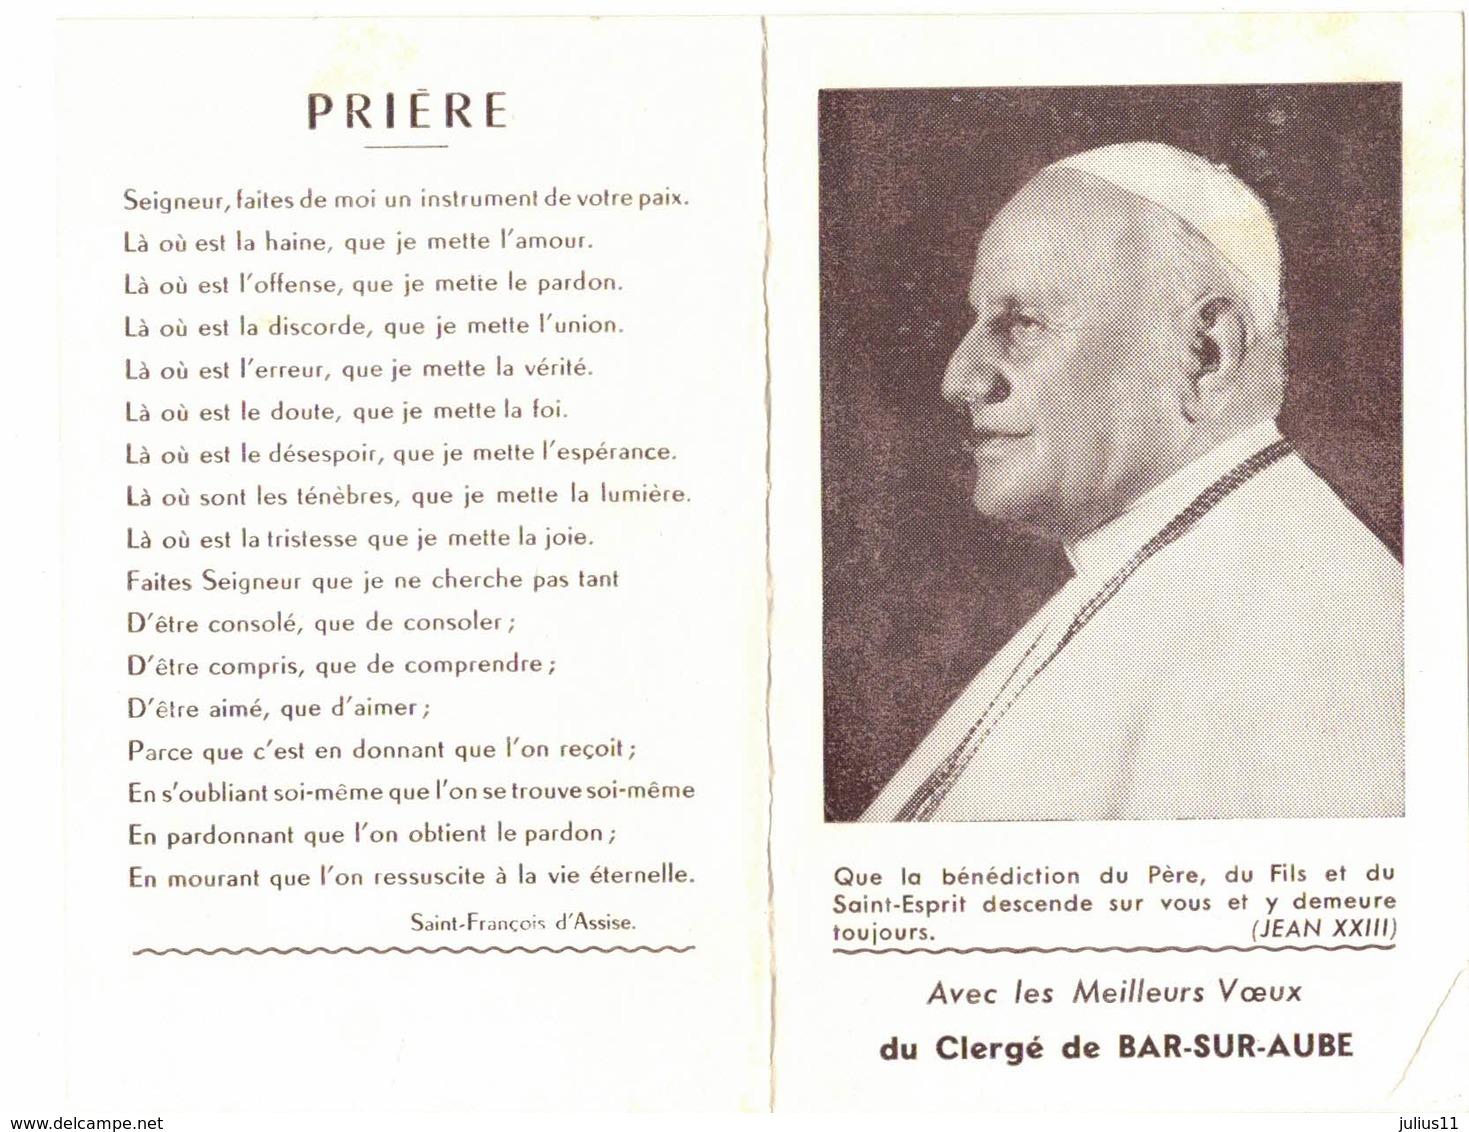 TROYES CALENDRIER ALMANACH 1961 JEAN XXIII BAR SUR AUBE IMAGE PIEUSE RELIGIEUSE HOLY CARD SANTINI HEILIG PRENTJE - Calendriers